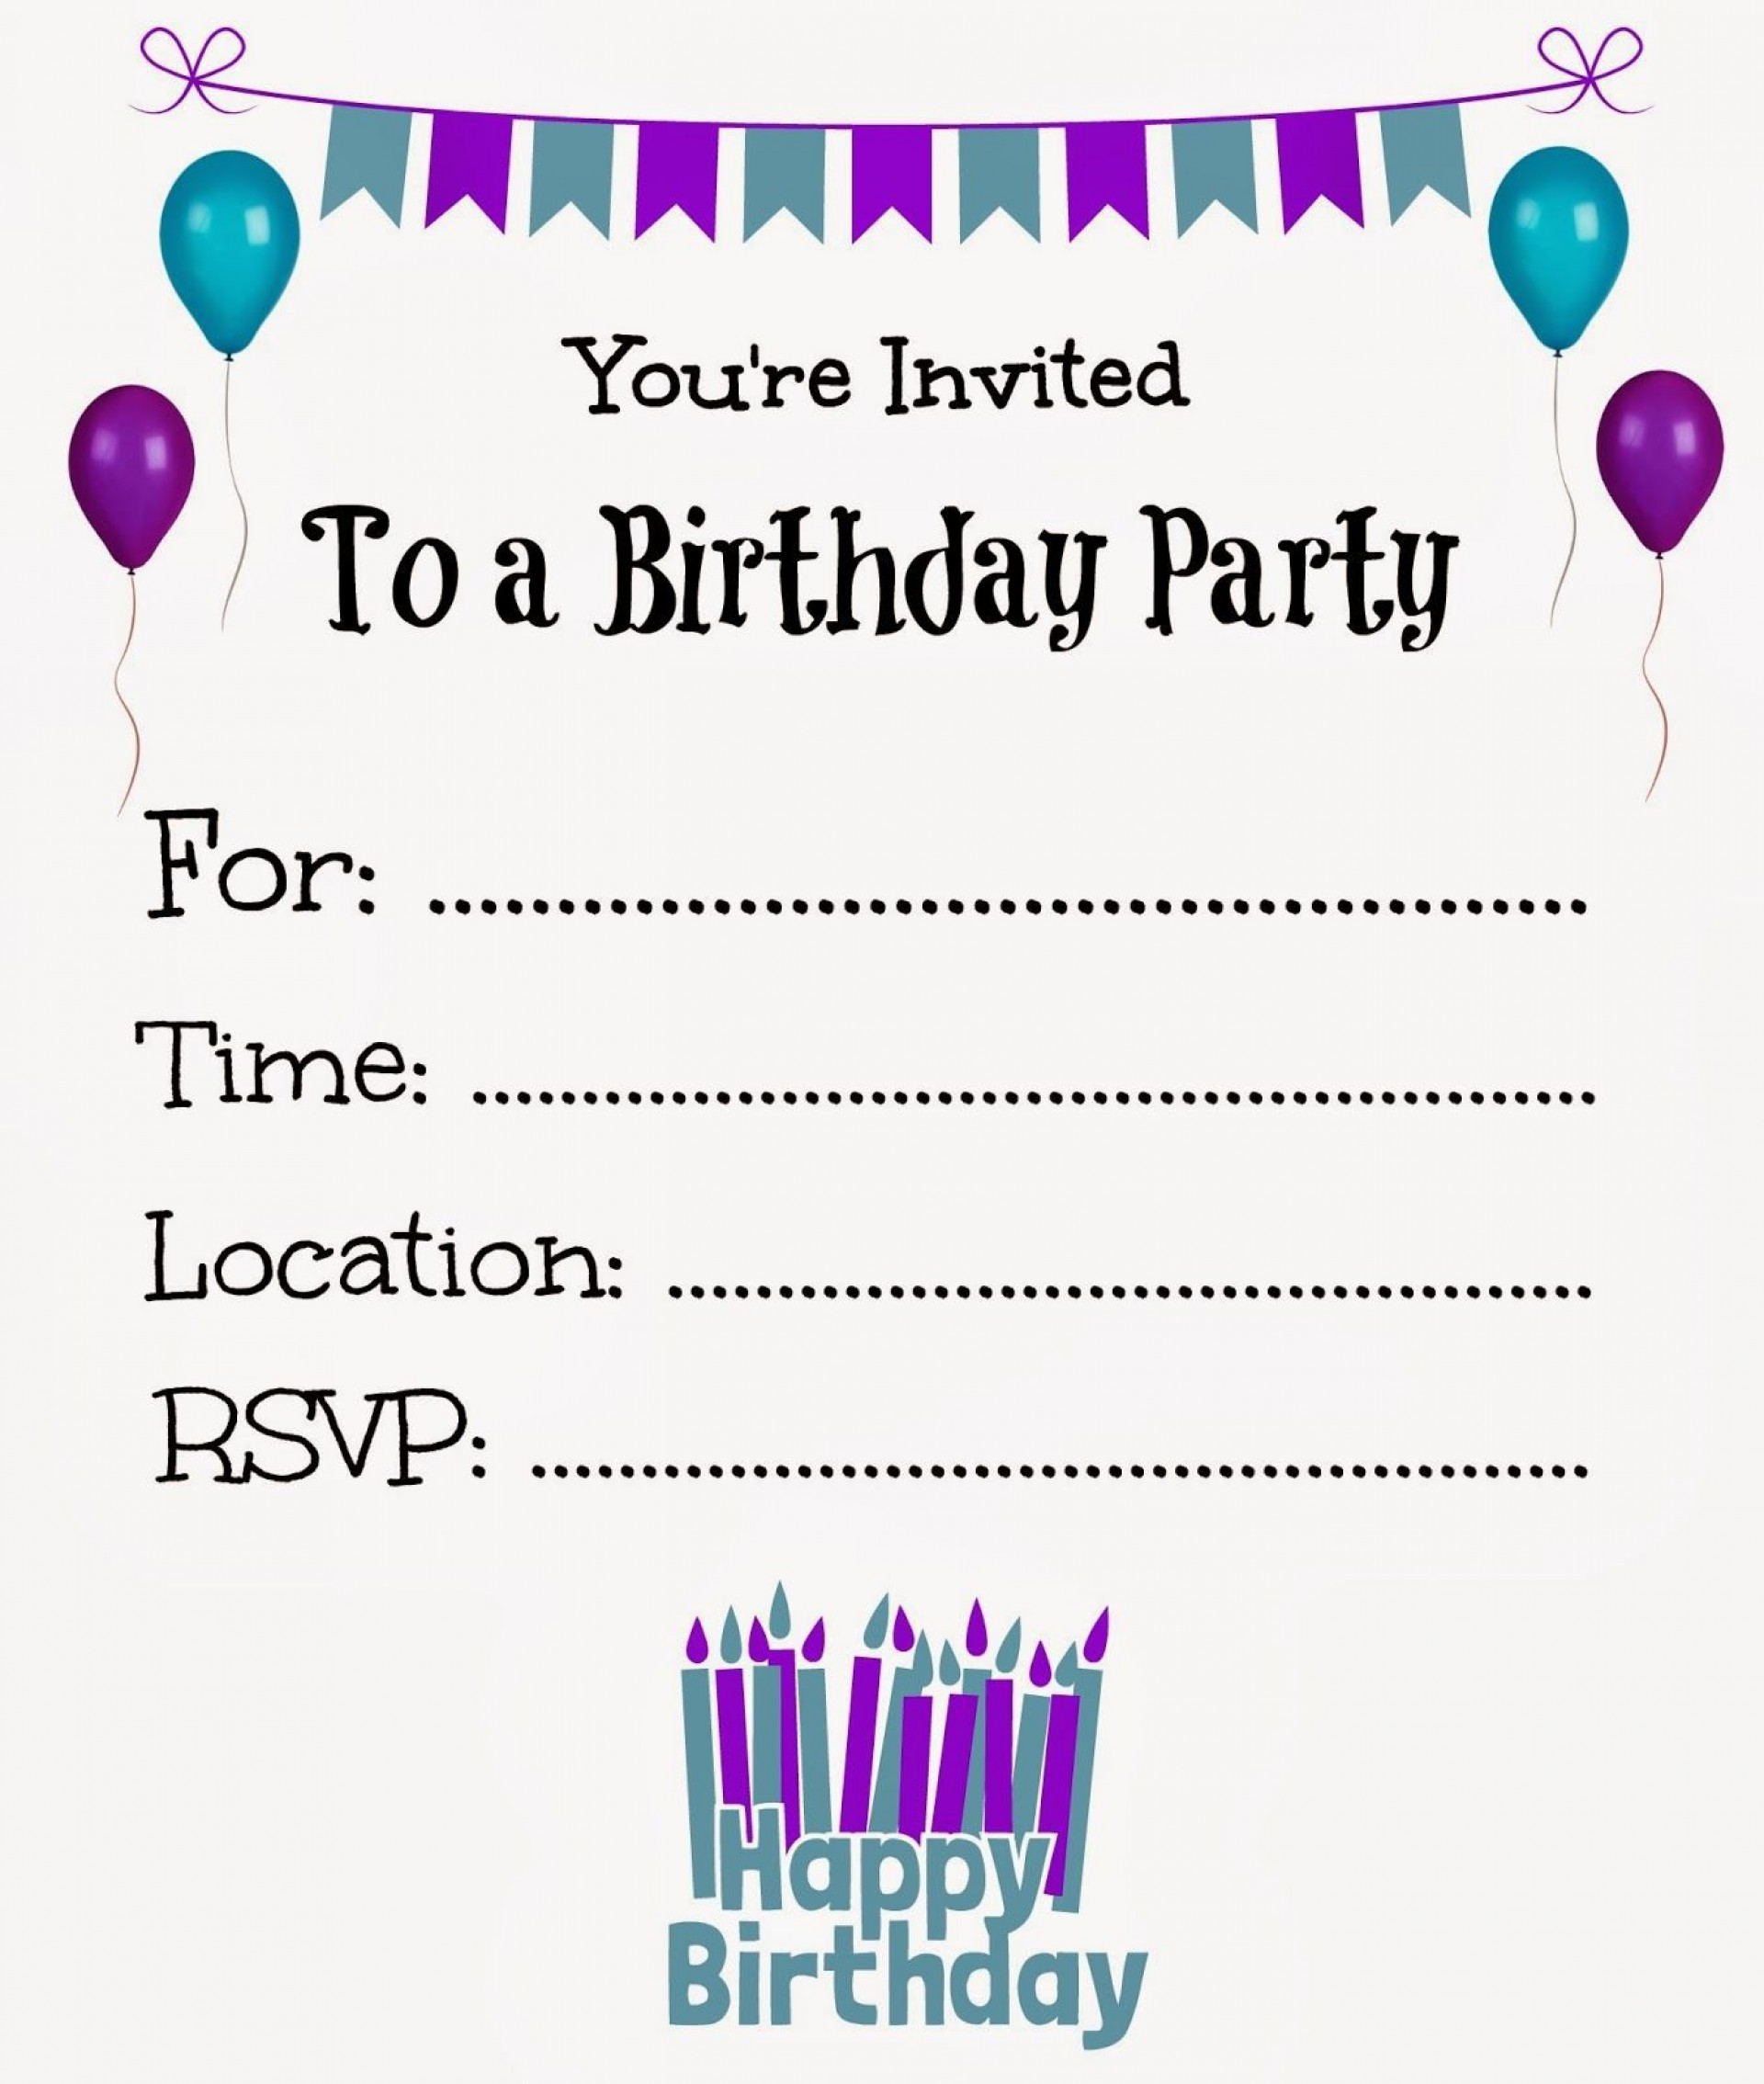 008 Breathtaking Free Online Birthday Invitation Maker Printable Inspiration  1st Card1920